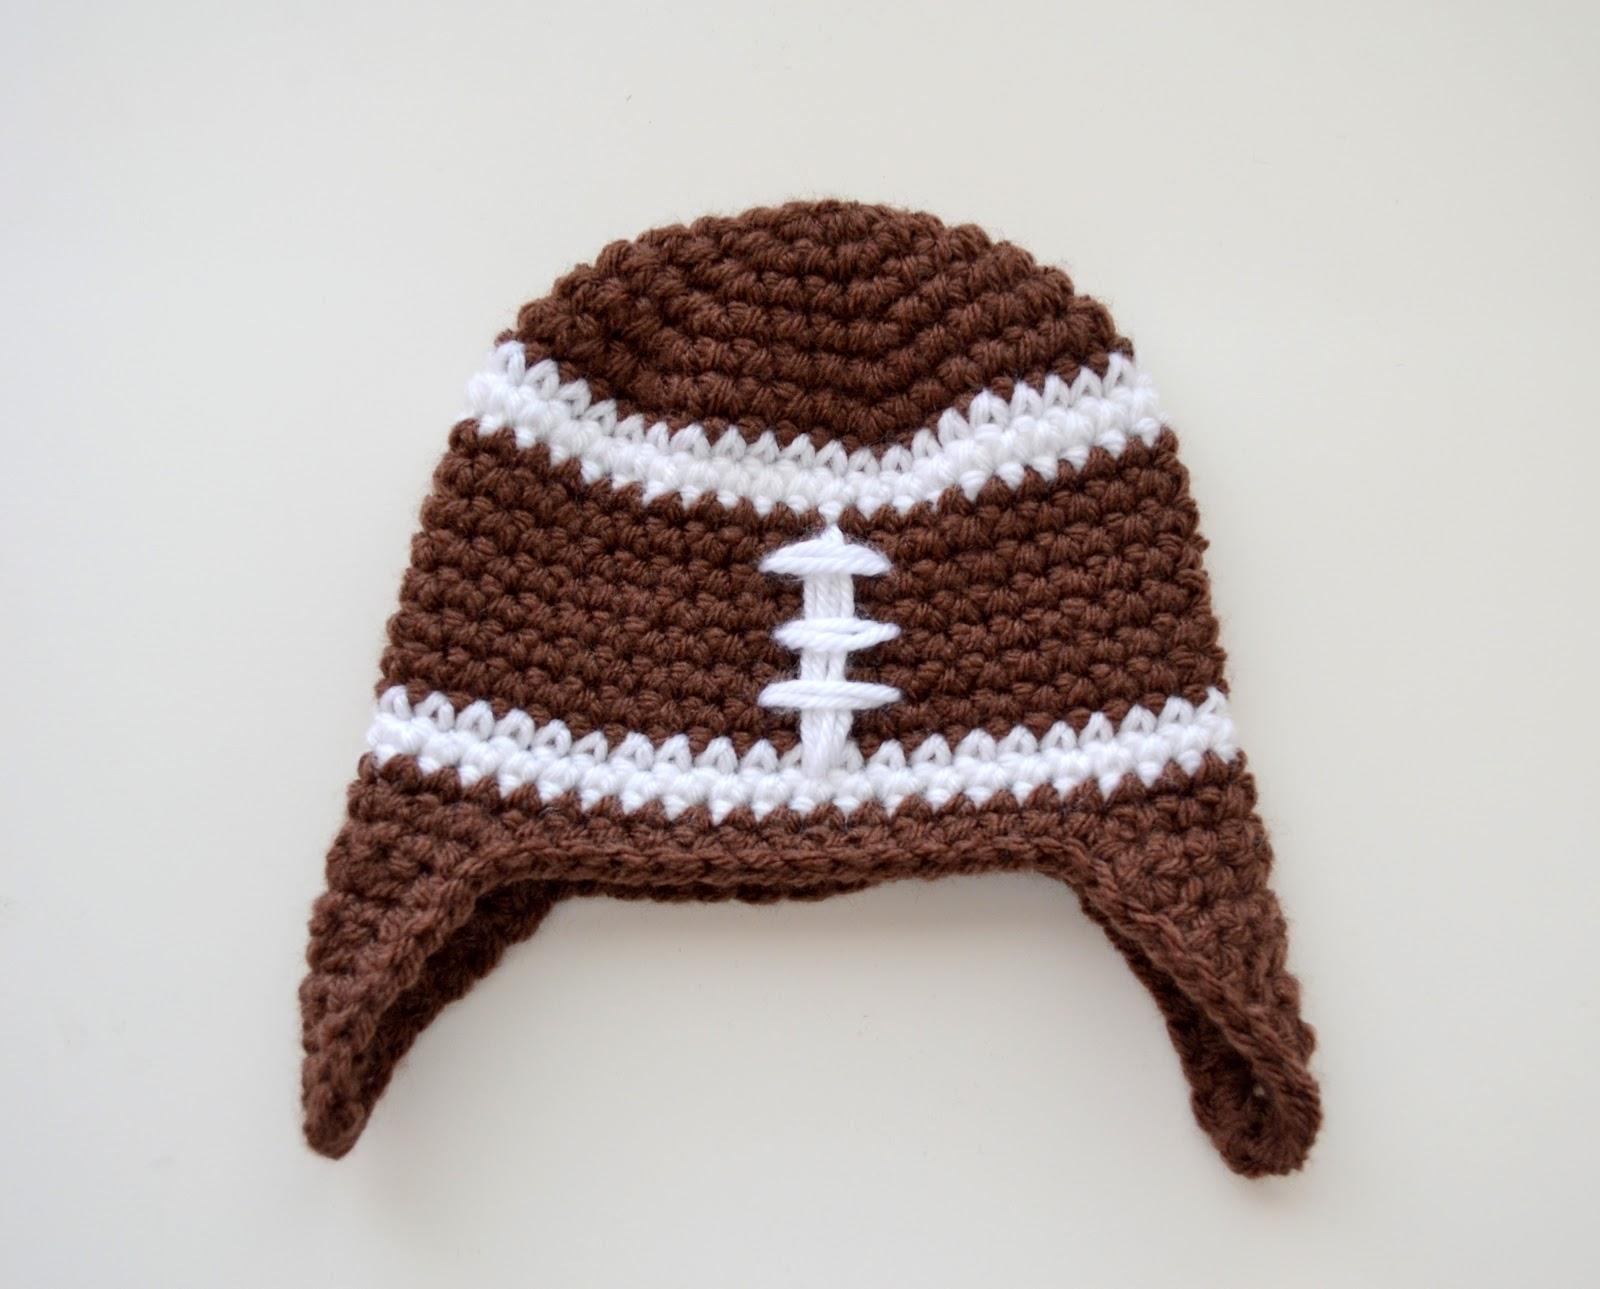 Crochet Baby Football Helmet Hat Pattern